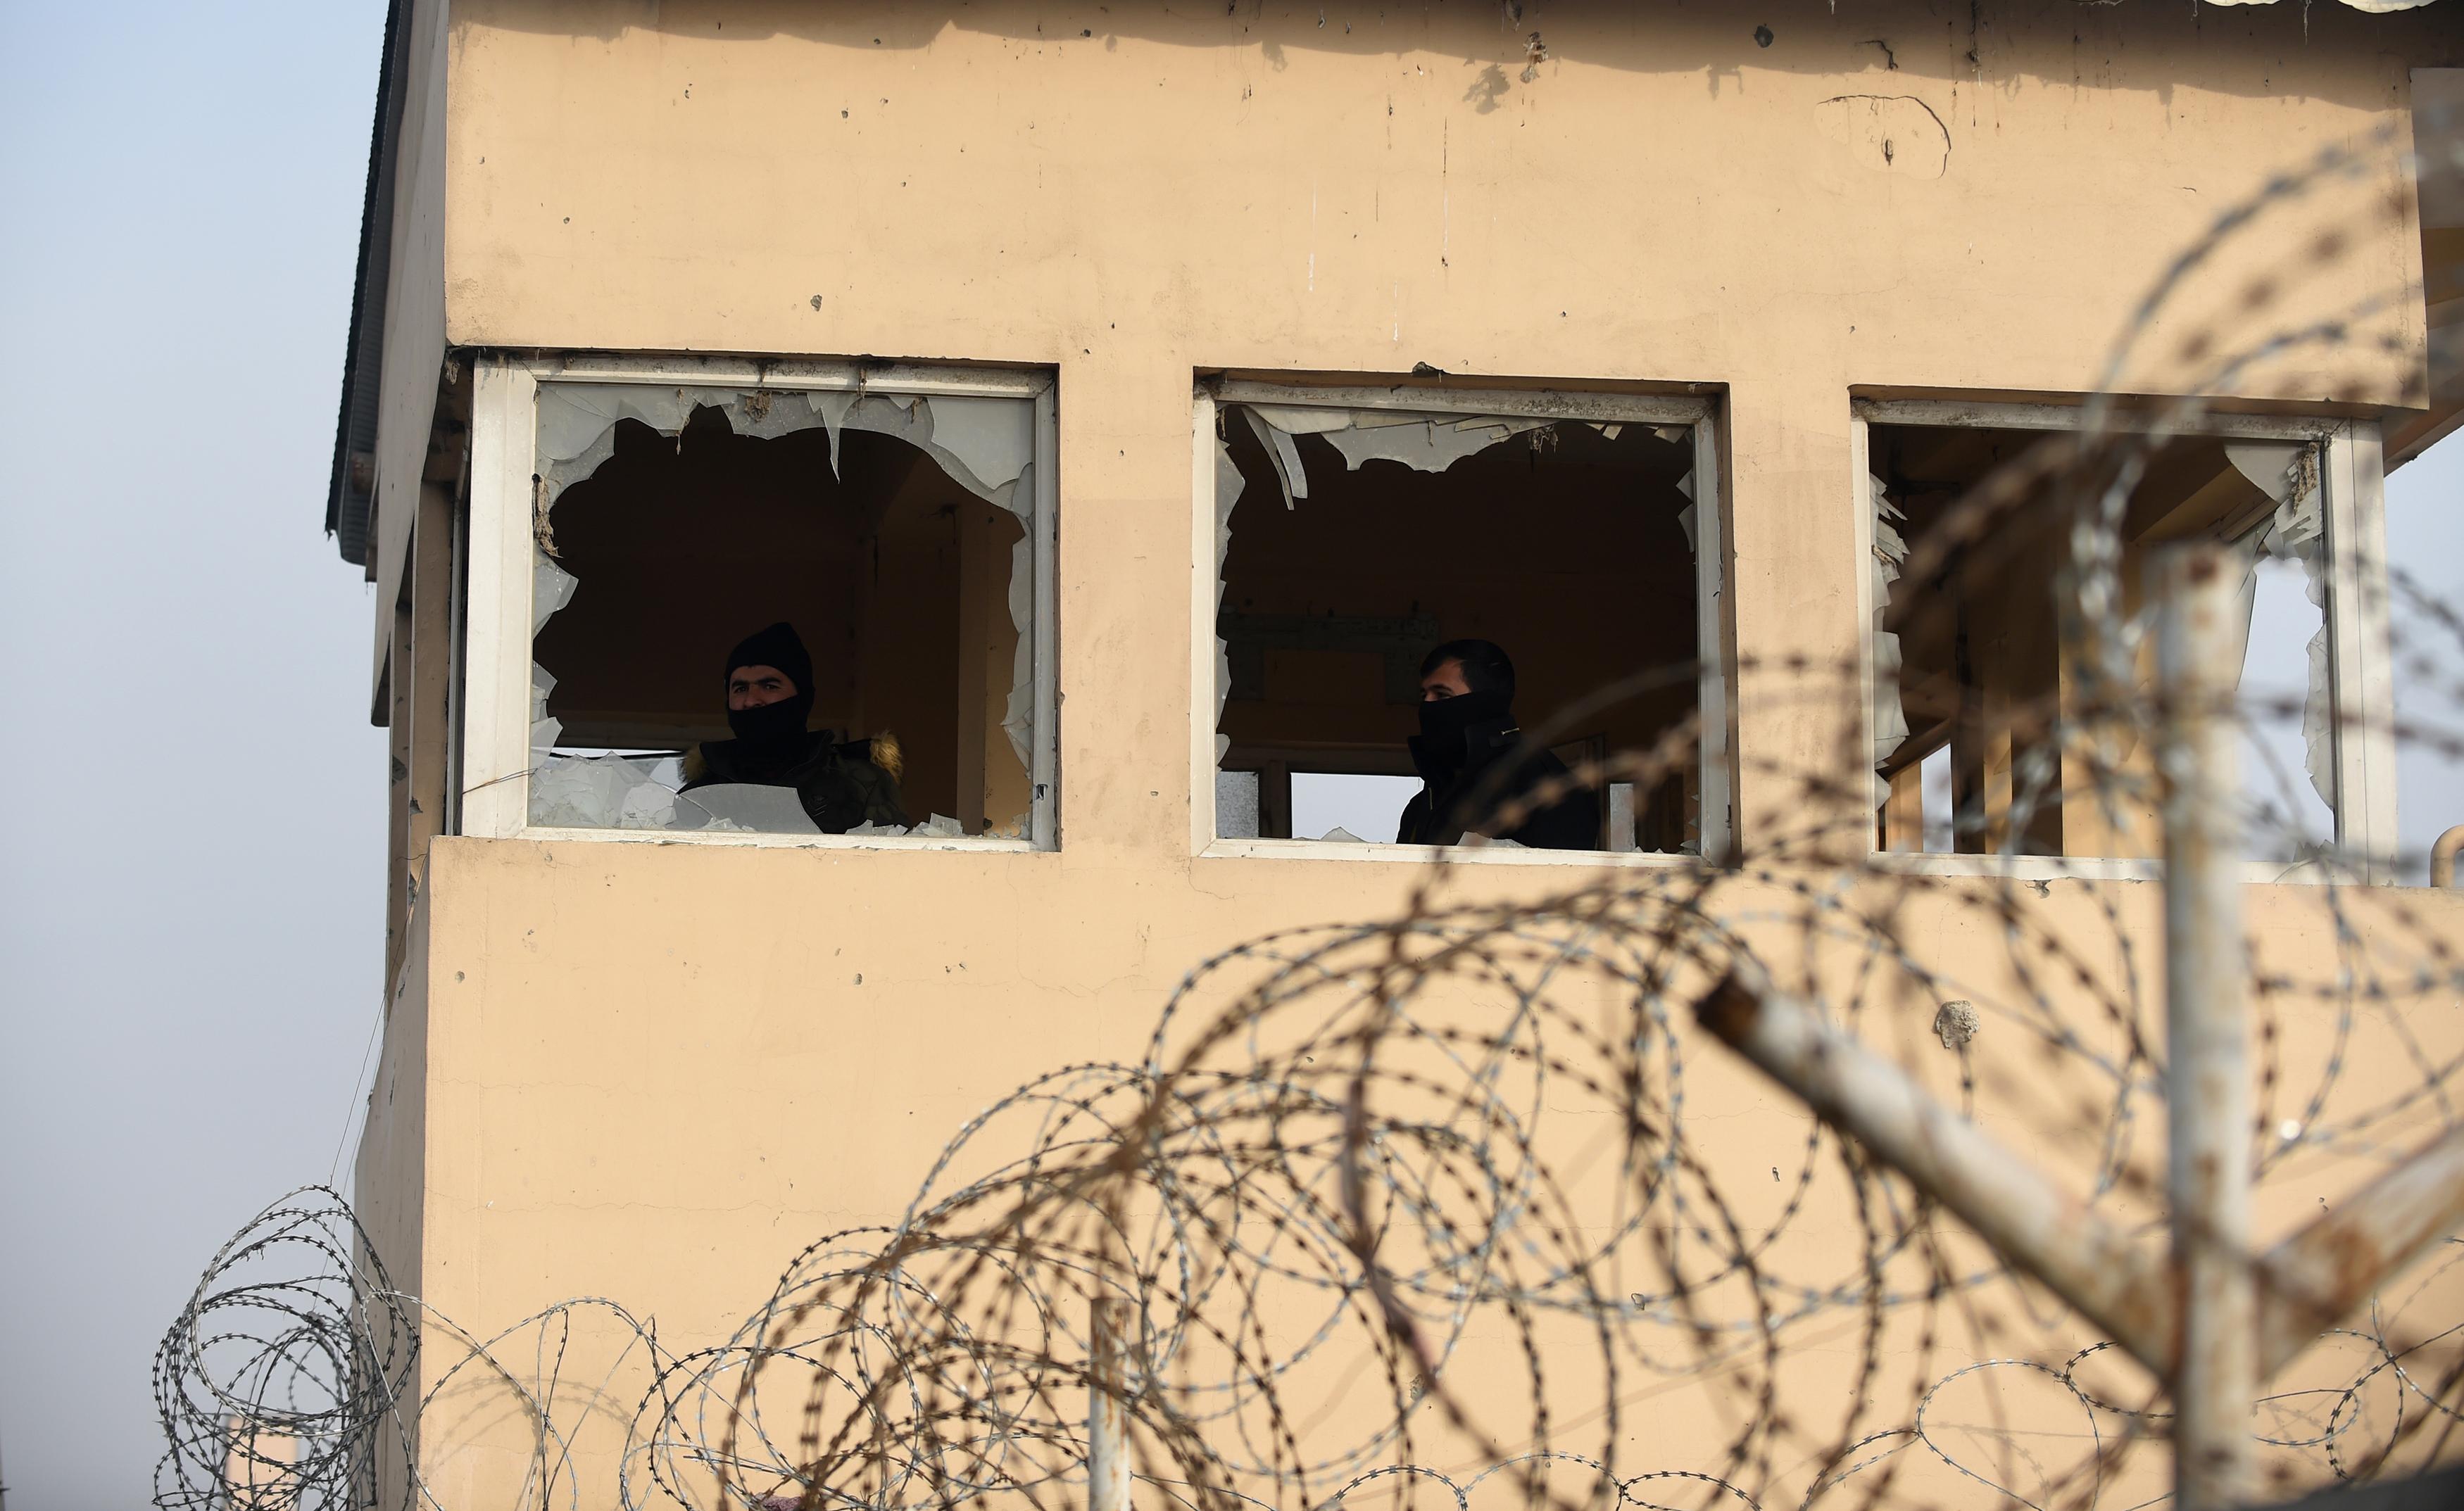 Taliban claim Kabul truck bombing, warn more to follow